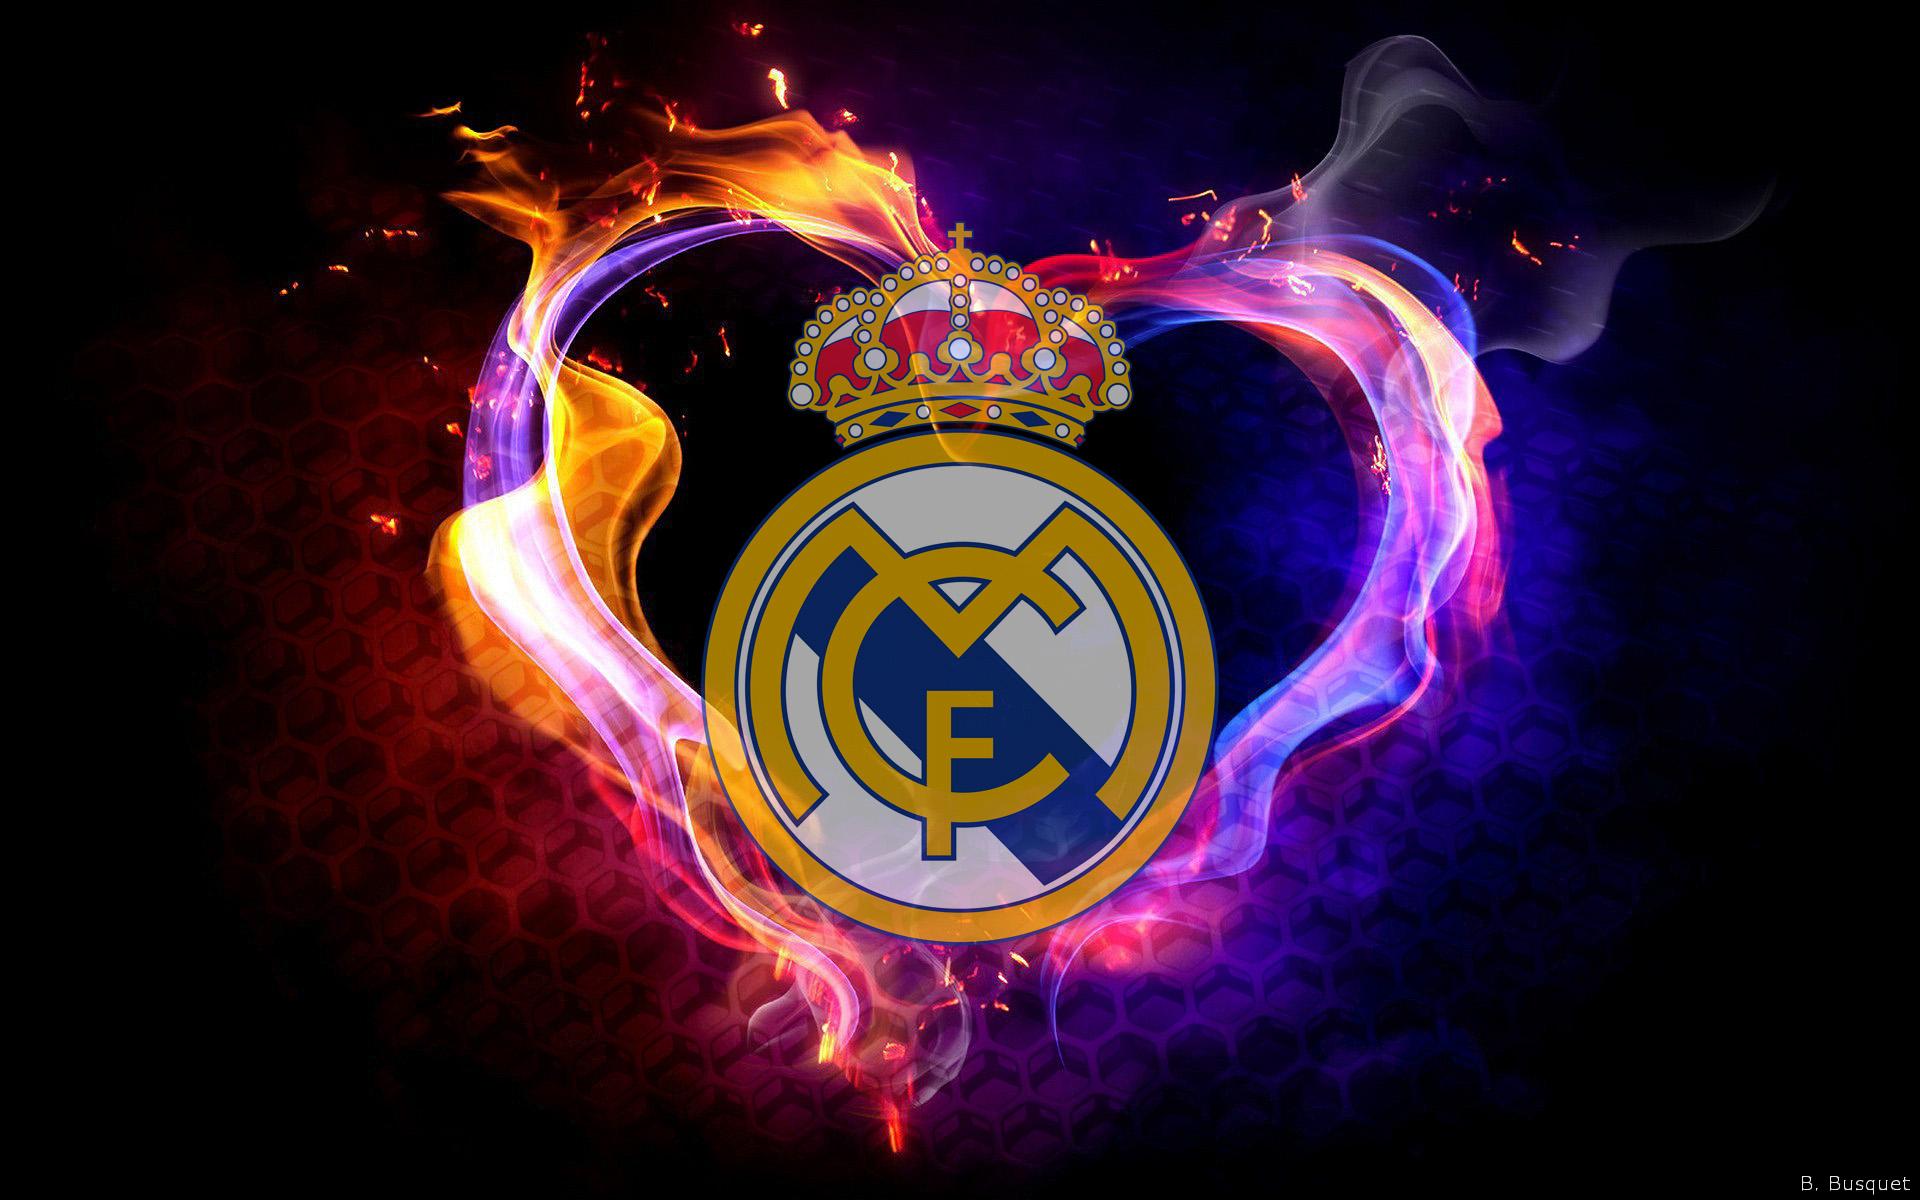 Real Madrid Logo Wallpaper Hd Pixelstalk Ideas Wallpapers Pinterest 1920x1200